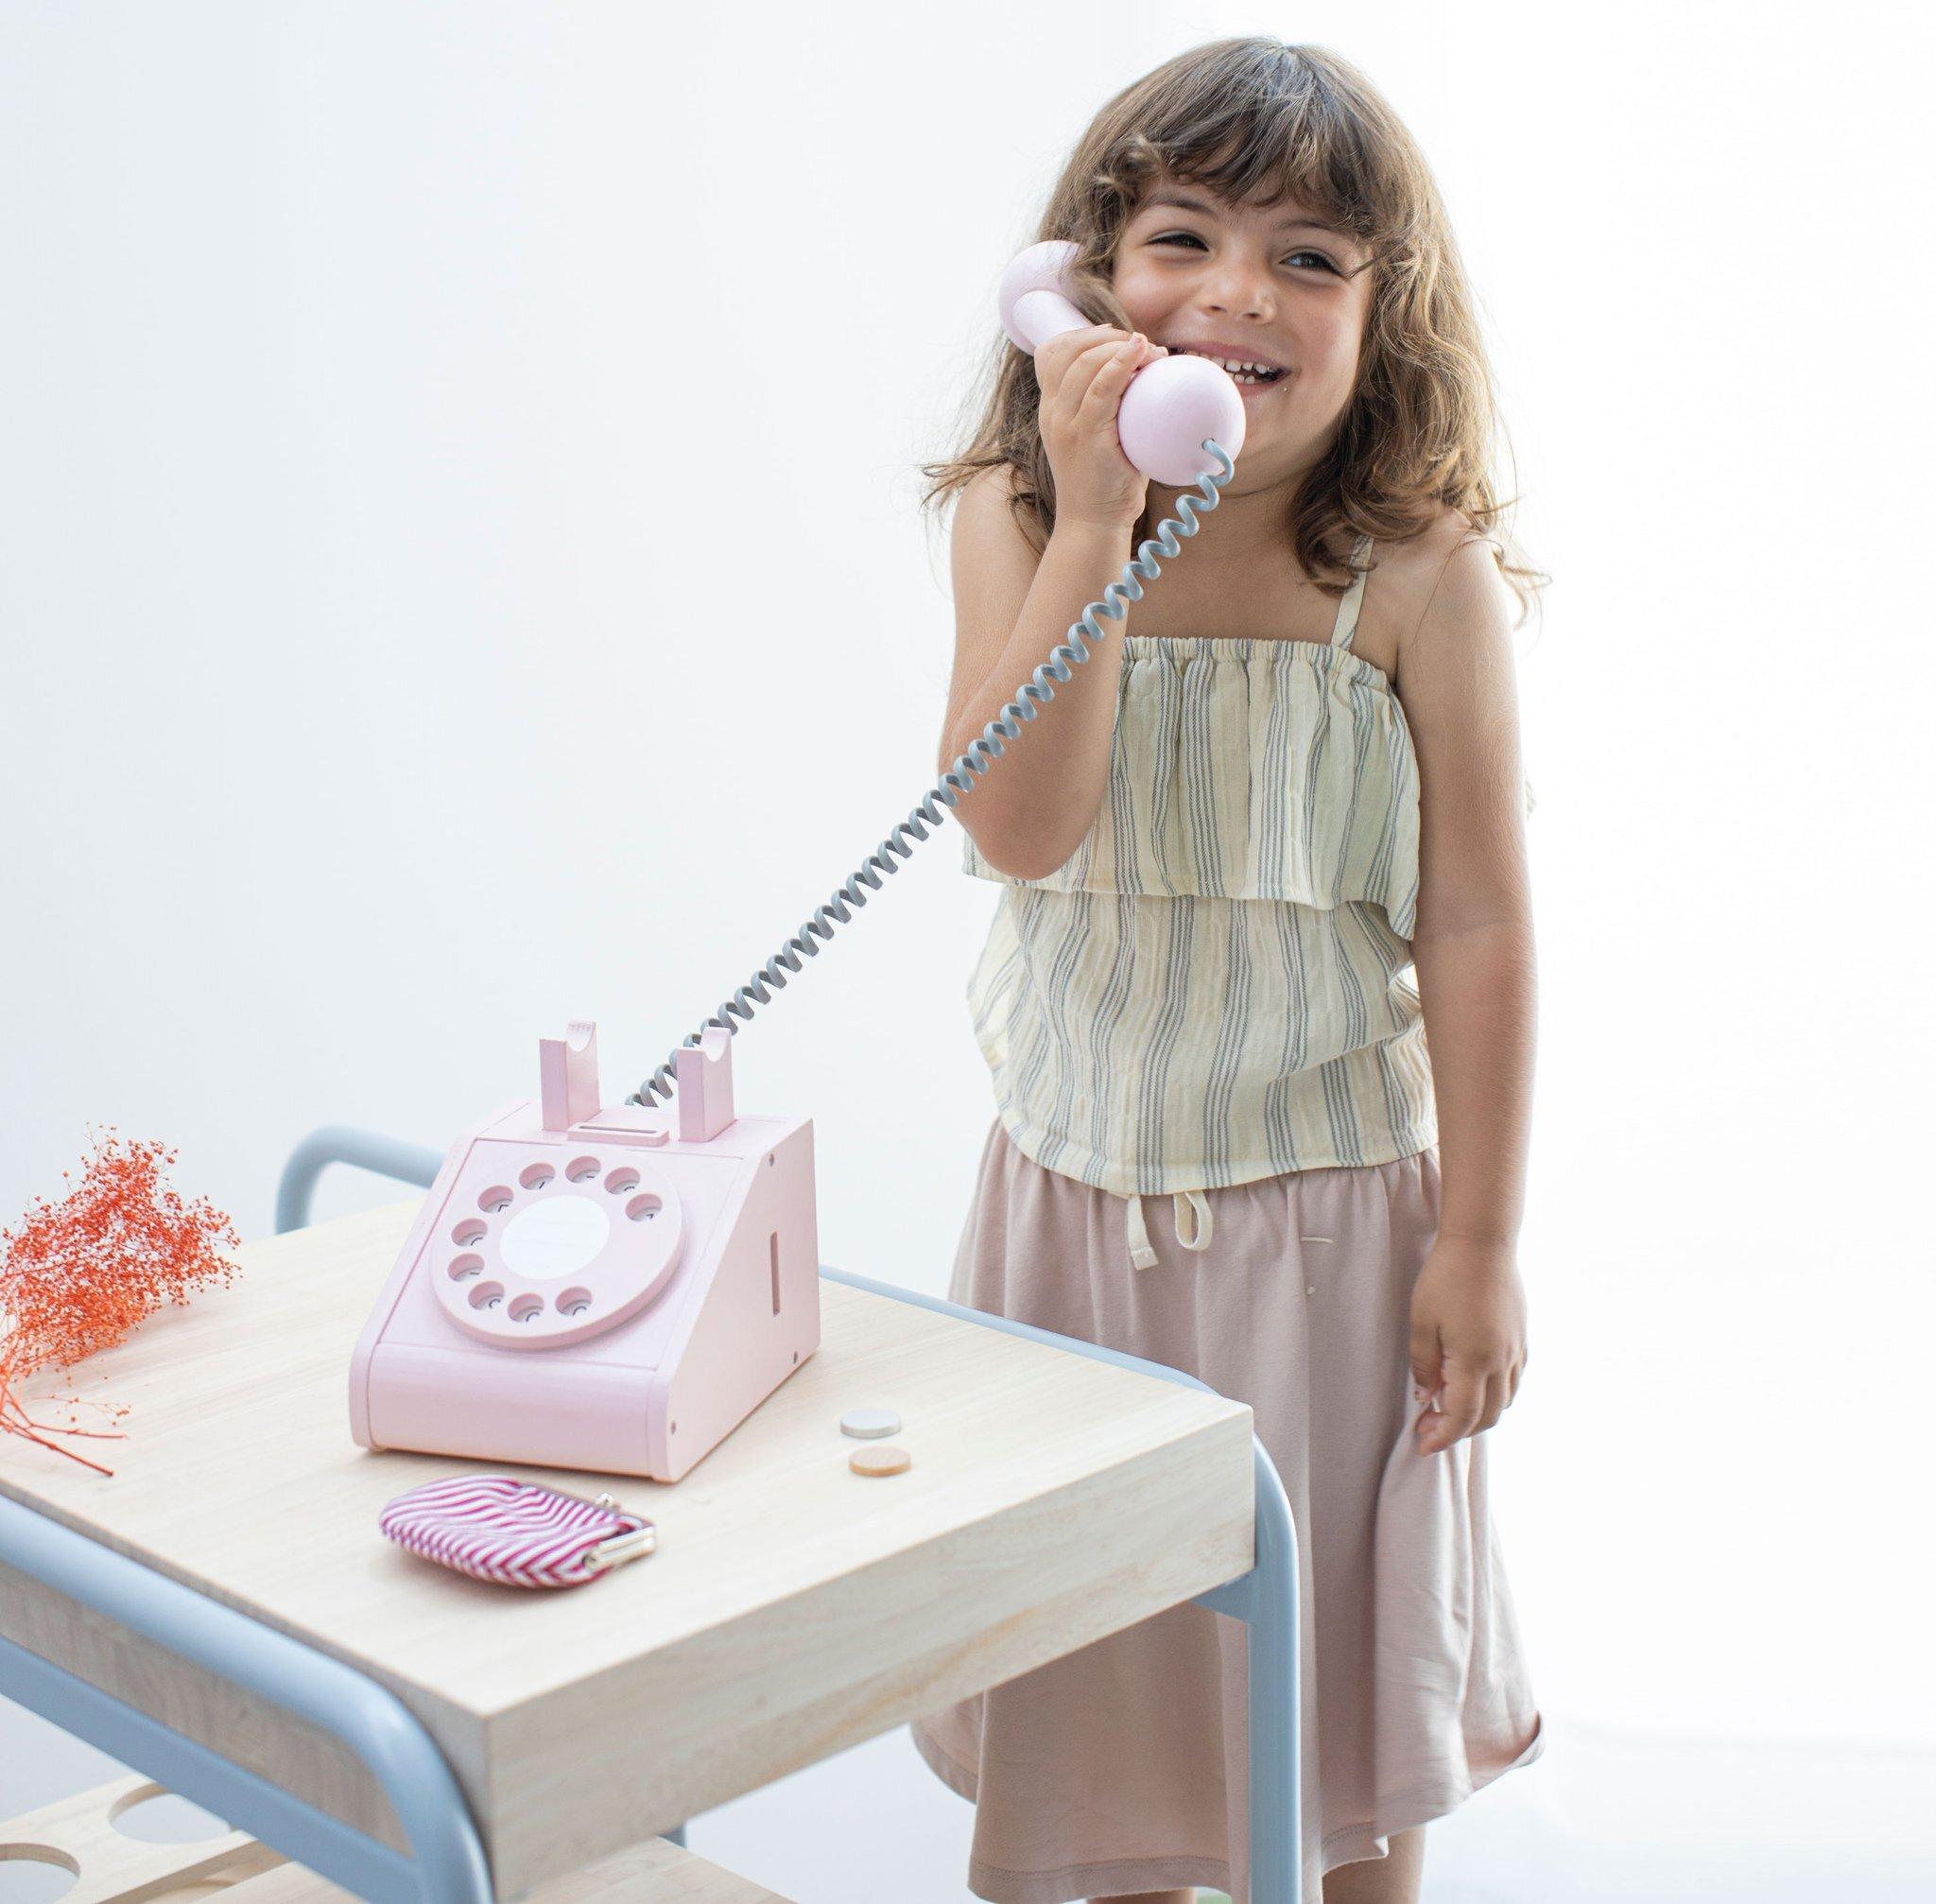 kiko(キコ) telephone(テレフォン) 木のおもちゃ 見た目も可愛く プレゼント に最適